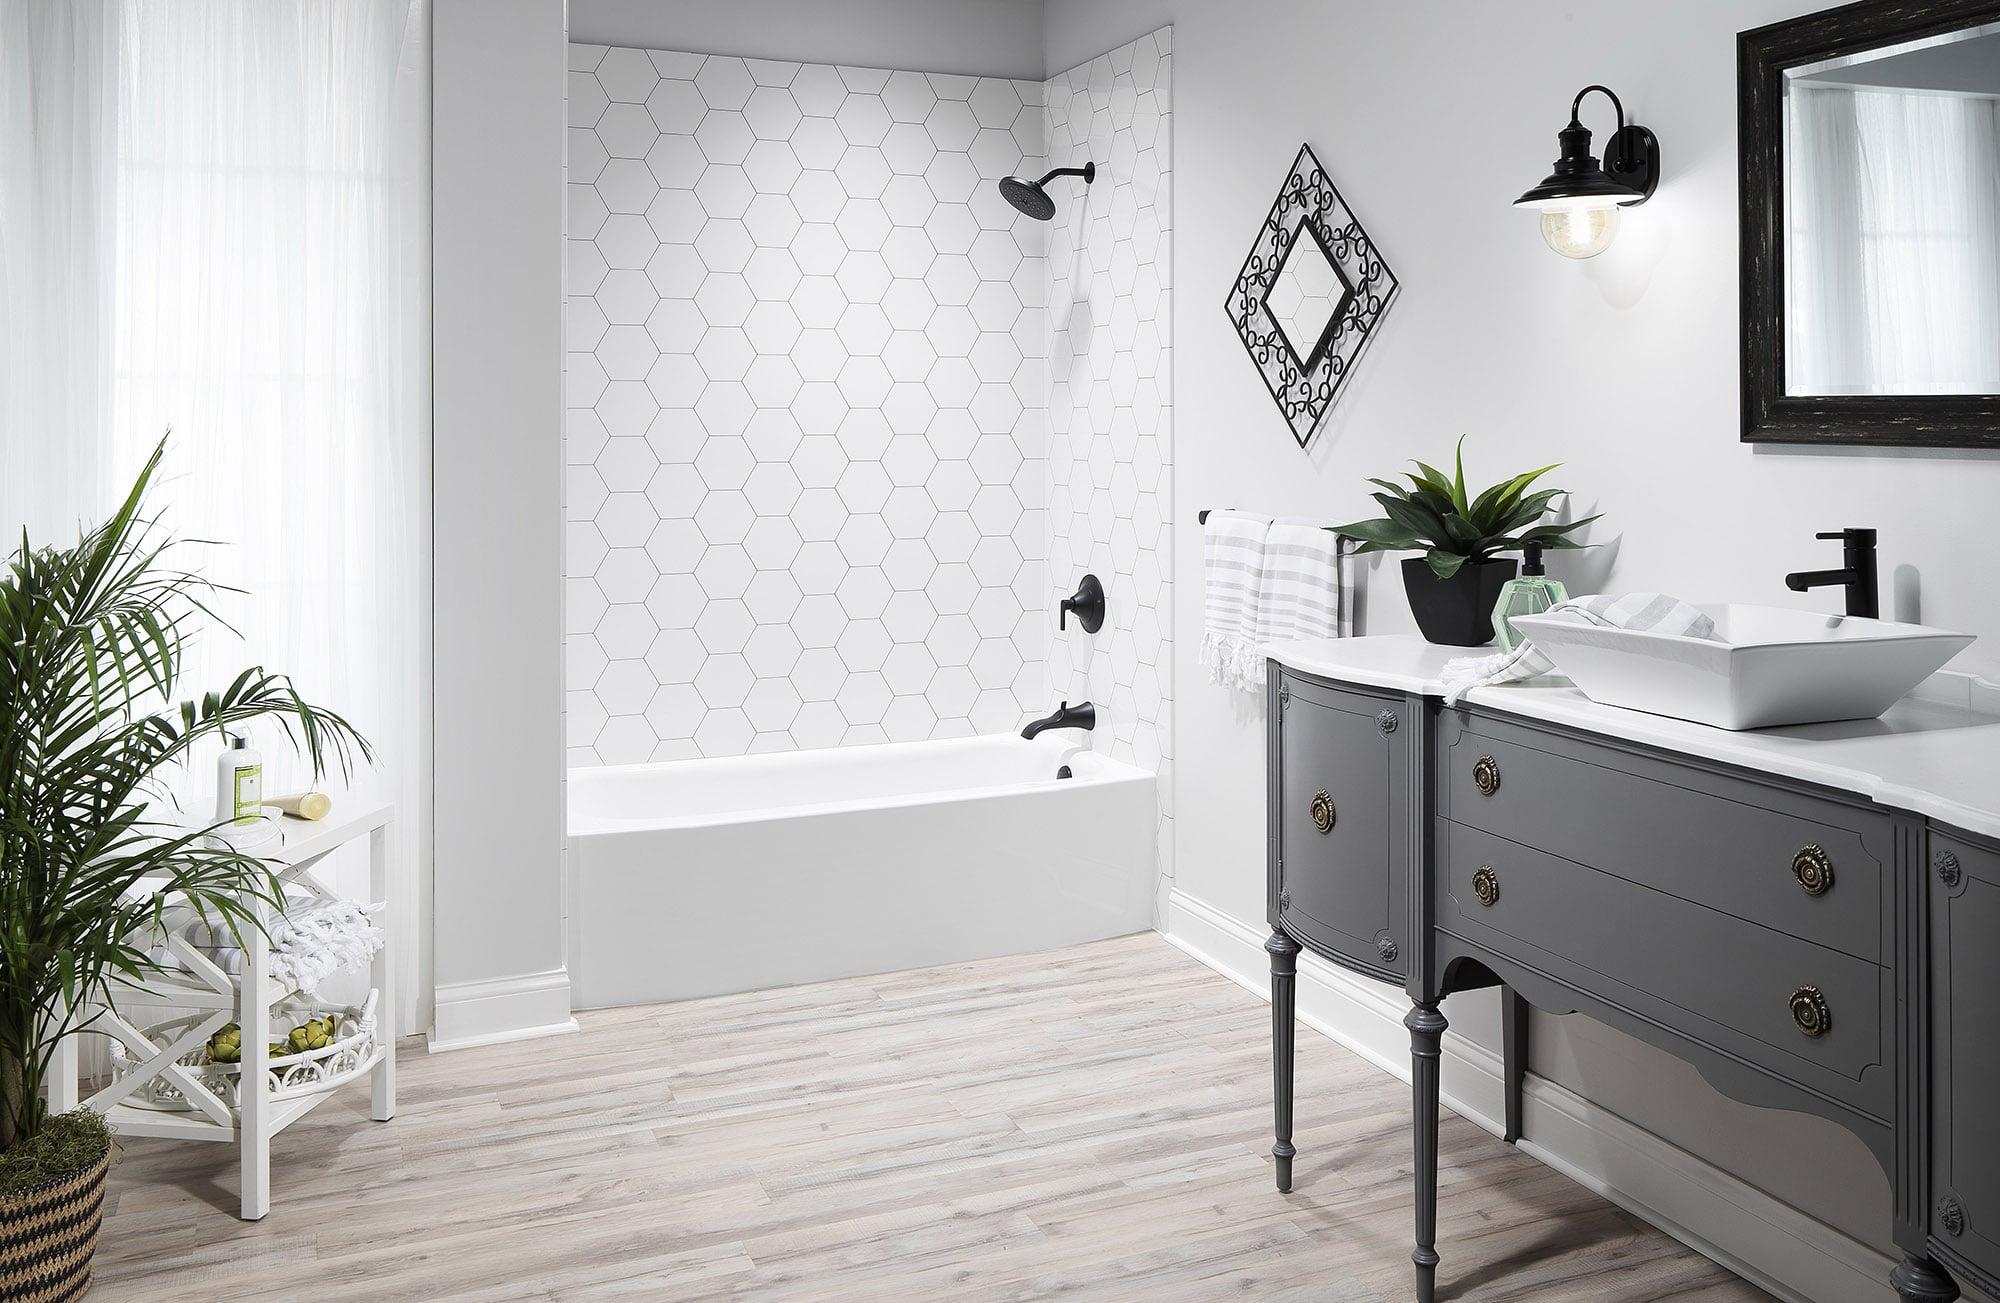 South Florida Bath Replacement - Bathrooms Plus Inc (9)